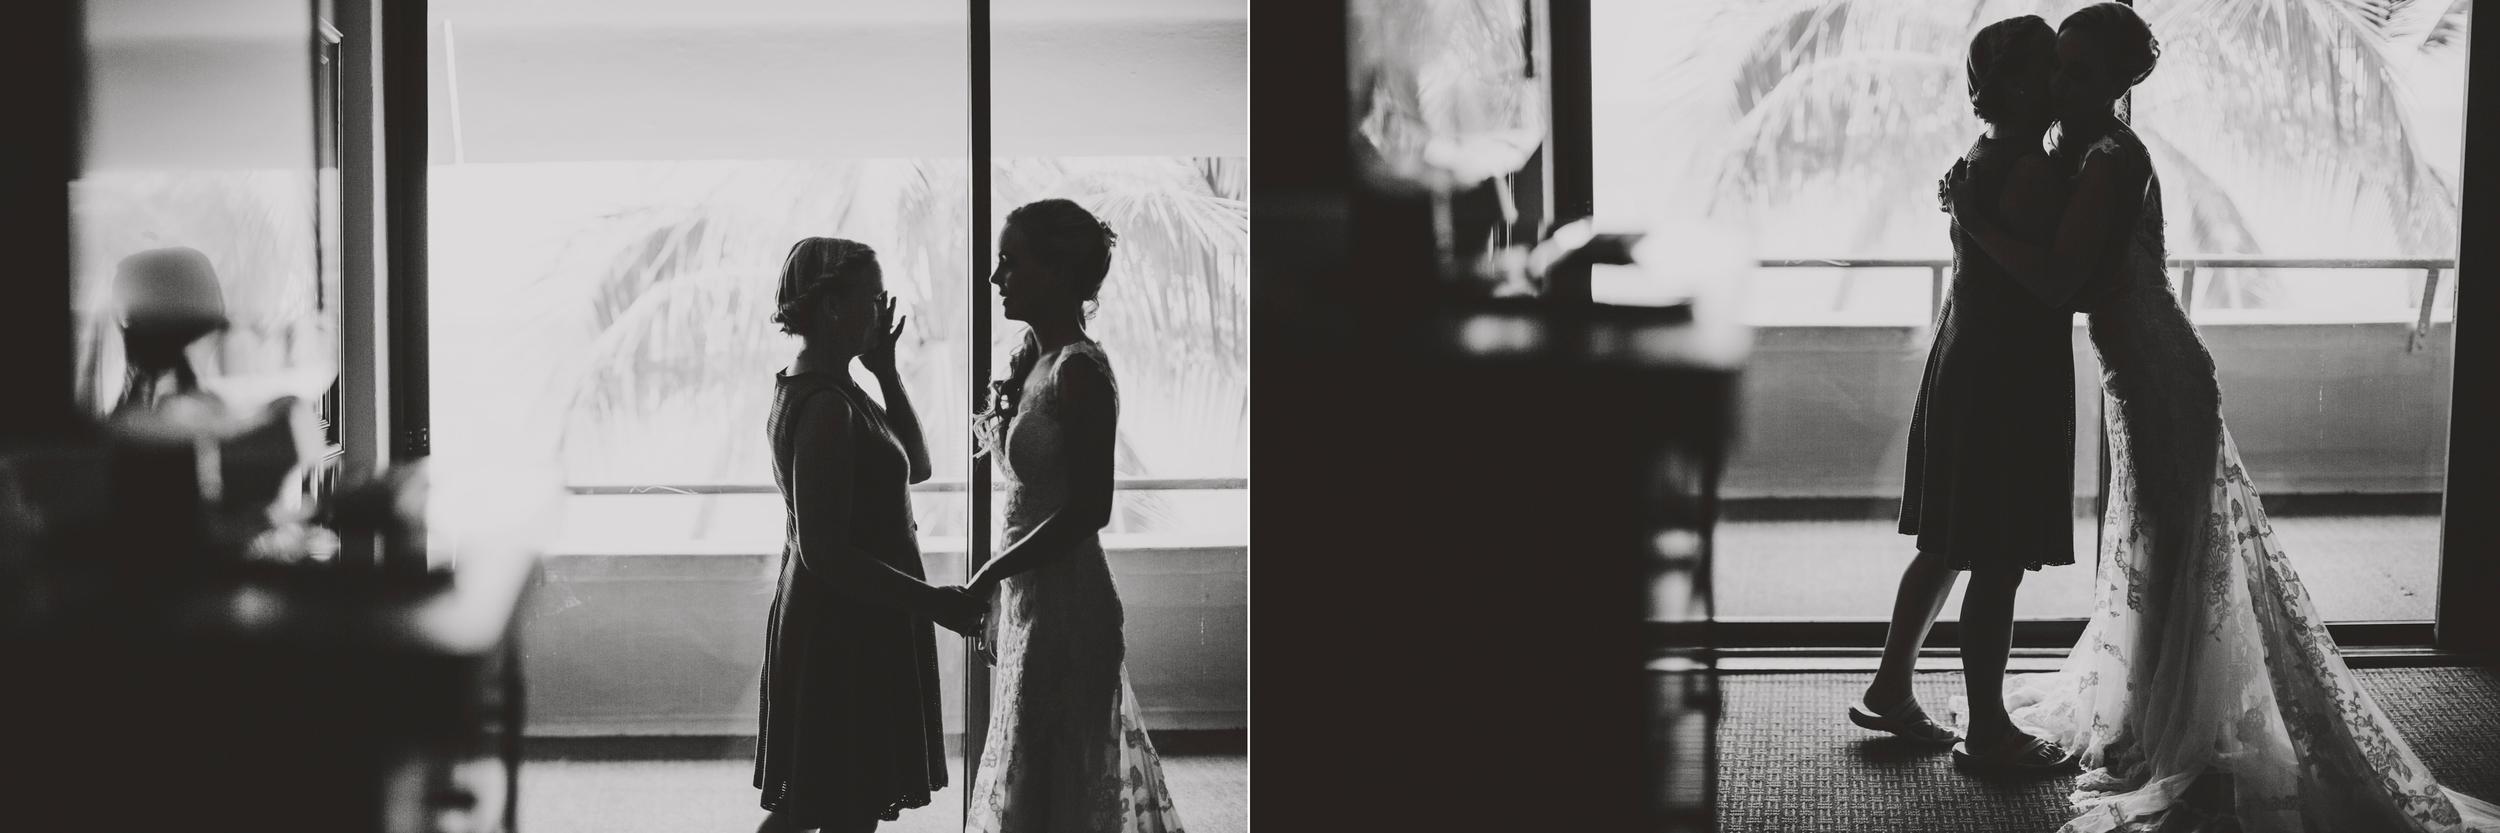 angie-diaz-photography-hawaii-wedding-photographer-kelli-jay-20.jpg